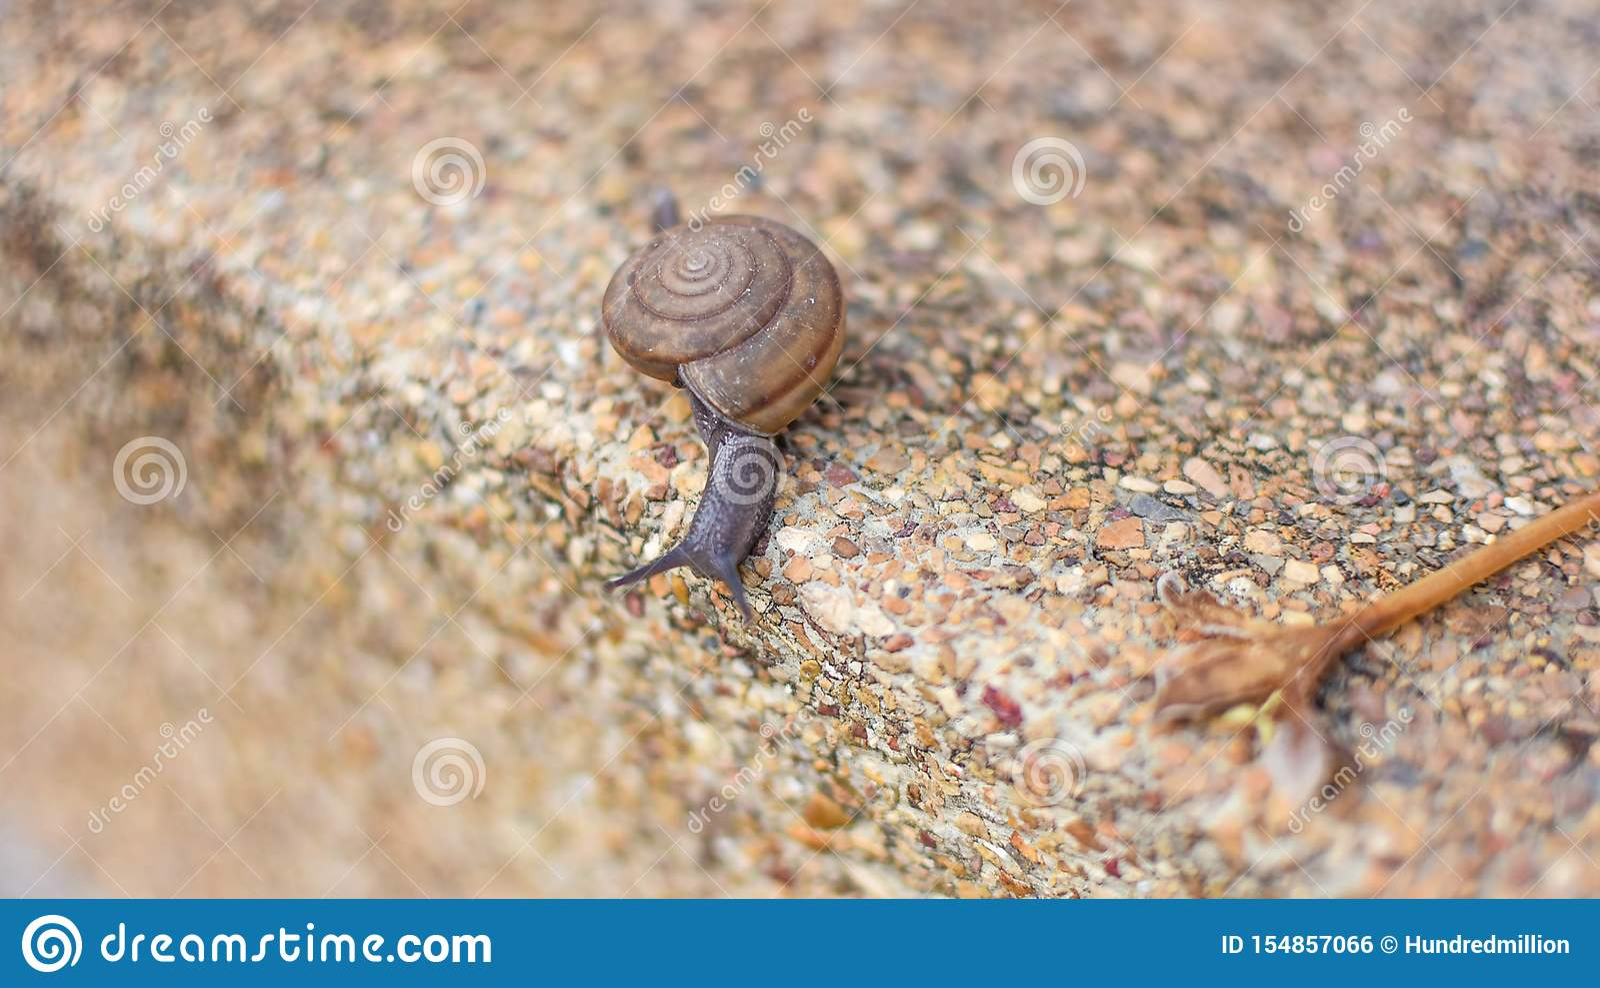 Little snails are walking around